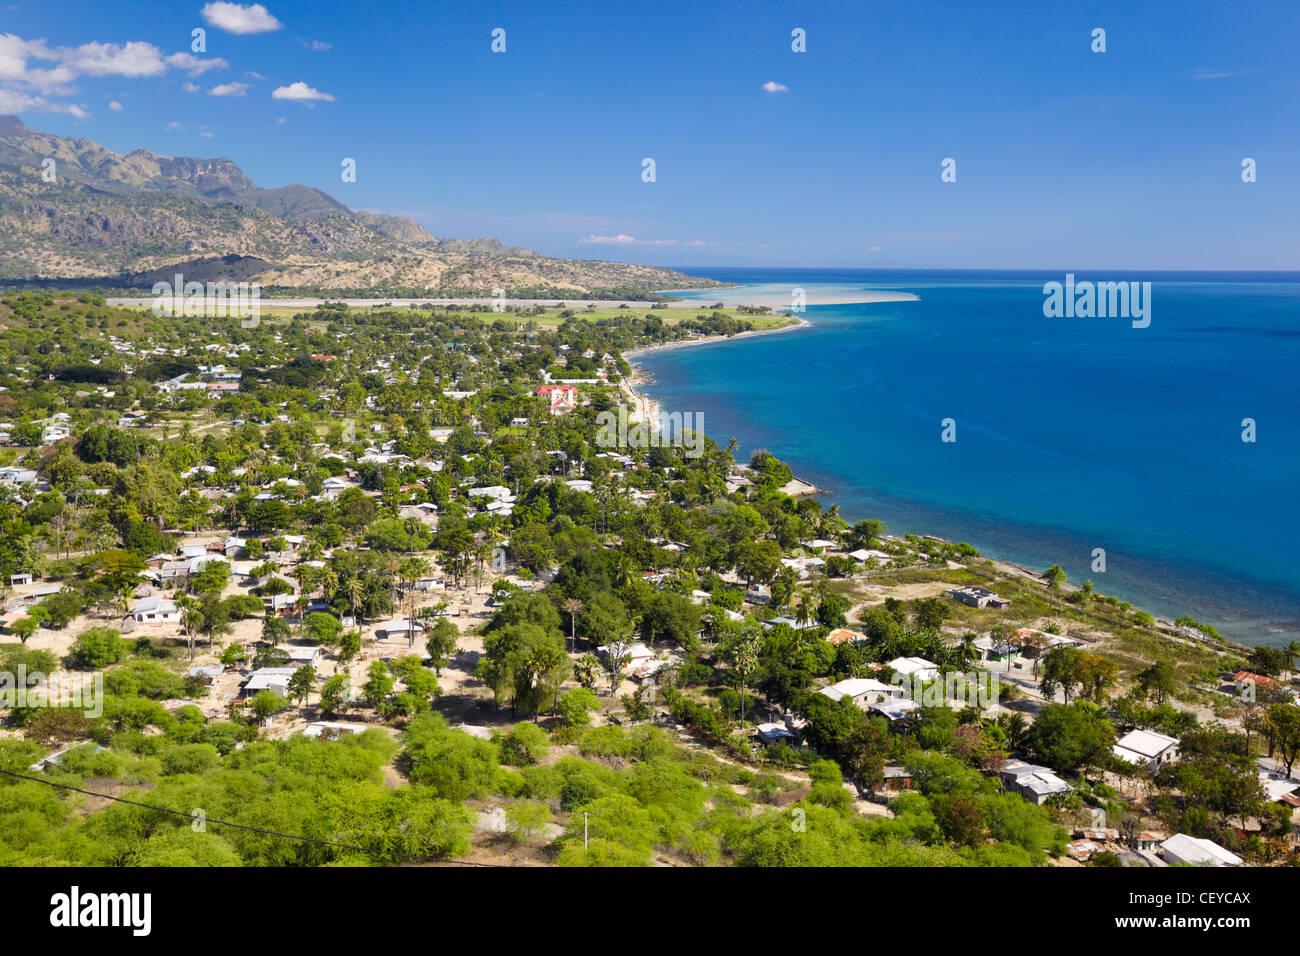 The town of Manatuto, Timor-Leste (East Timor), Asia - Stock Image